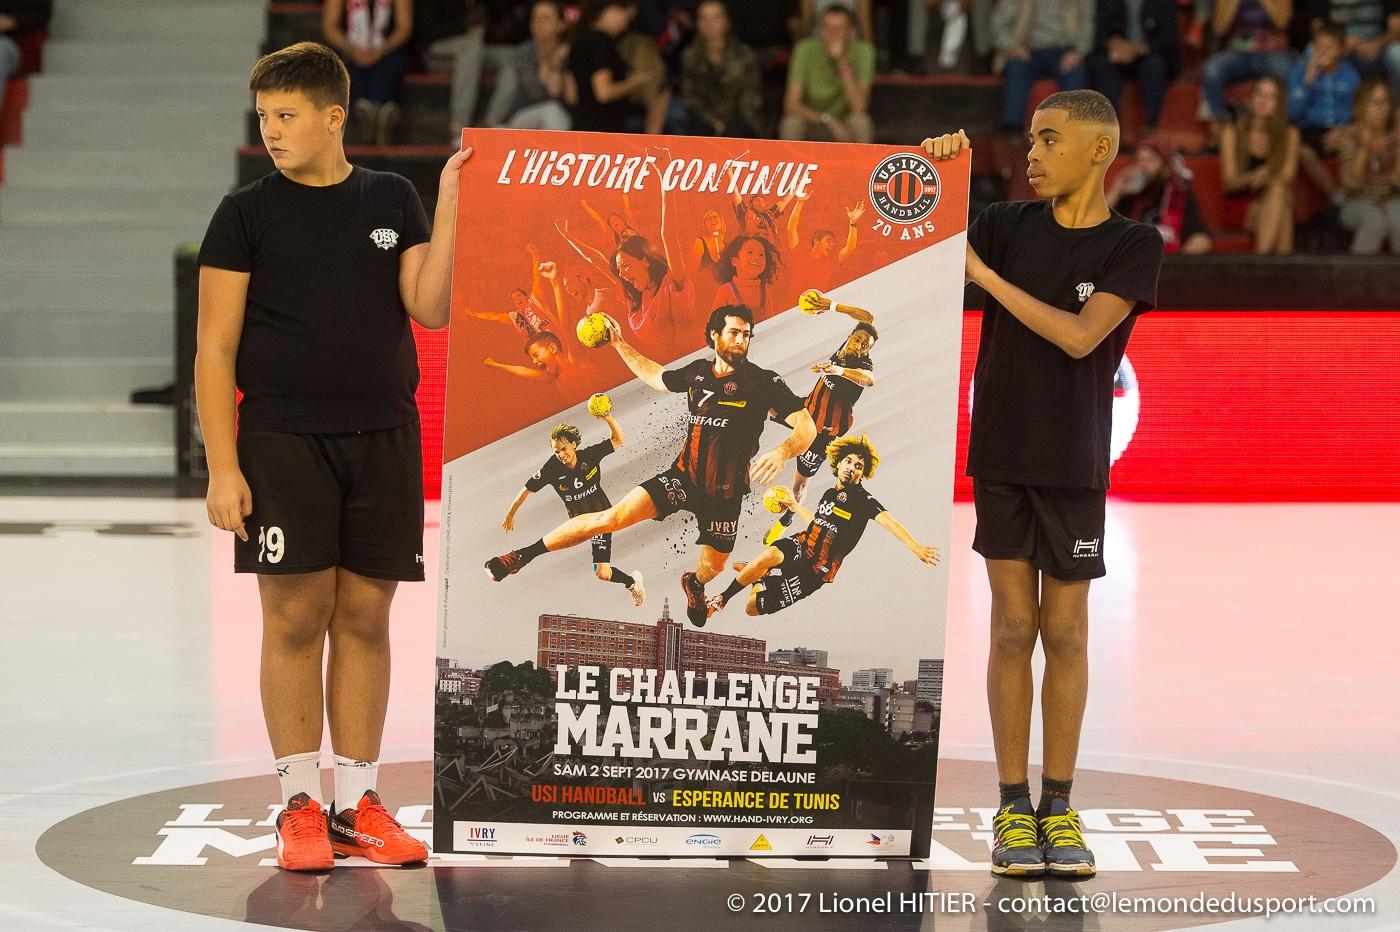 Marrane 2017 US Ivry - Esperance de Tunis (Lionel Hitier)